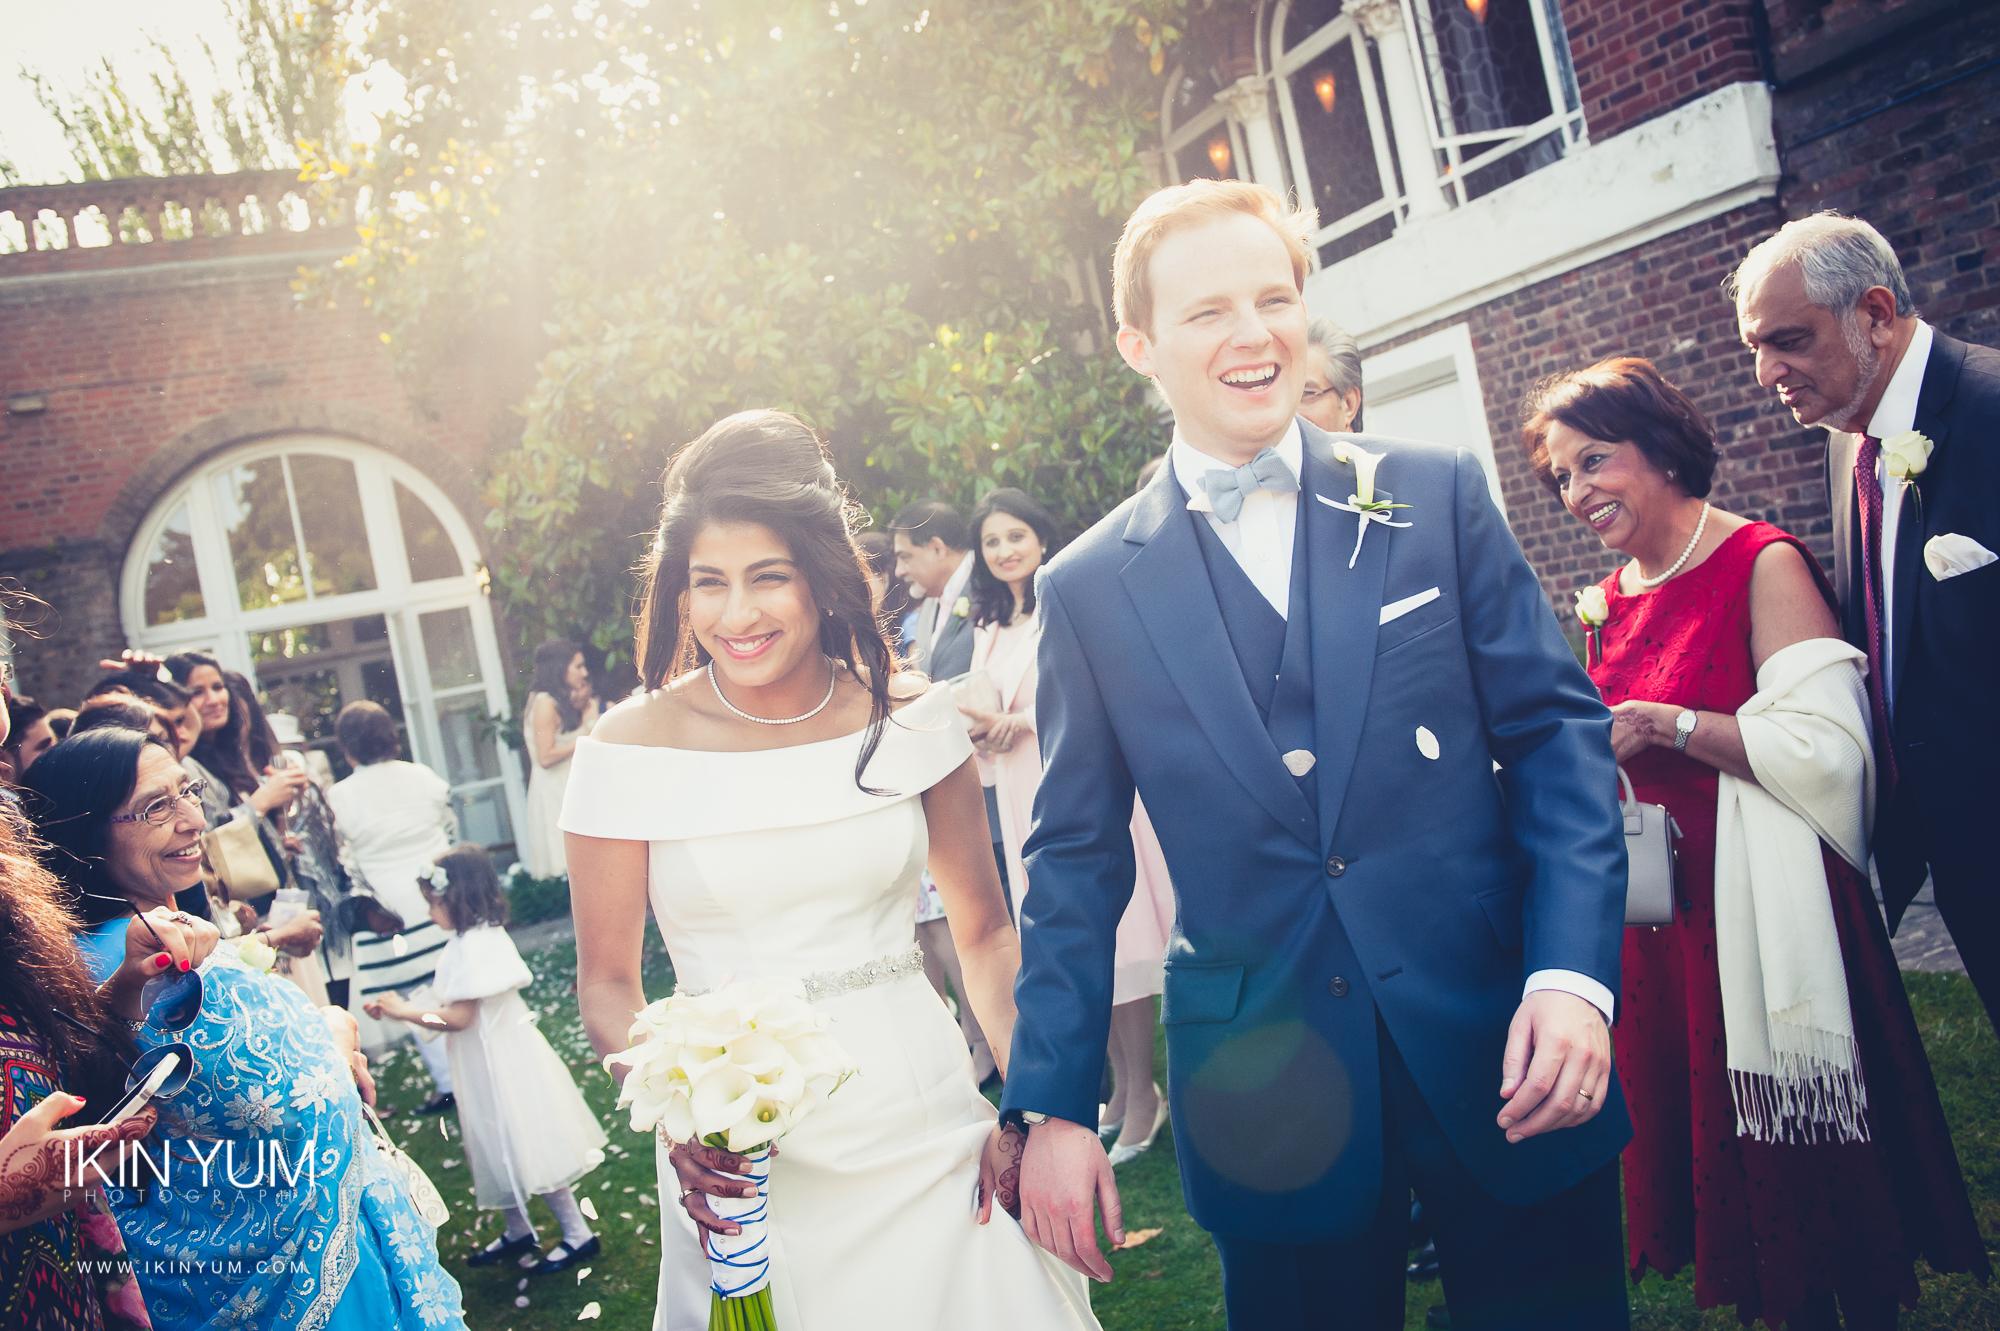 Holland Park Wedding - London Asian Wedding Photographer